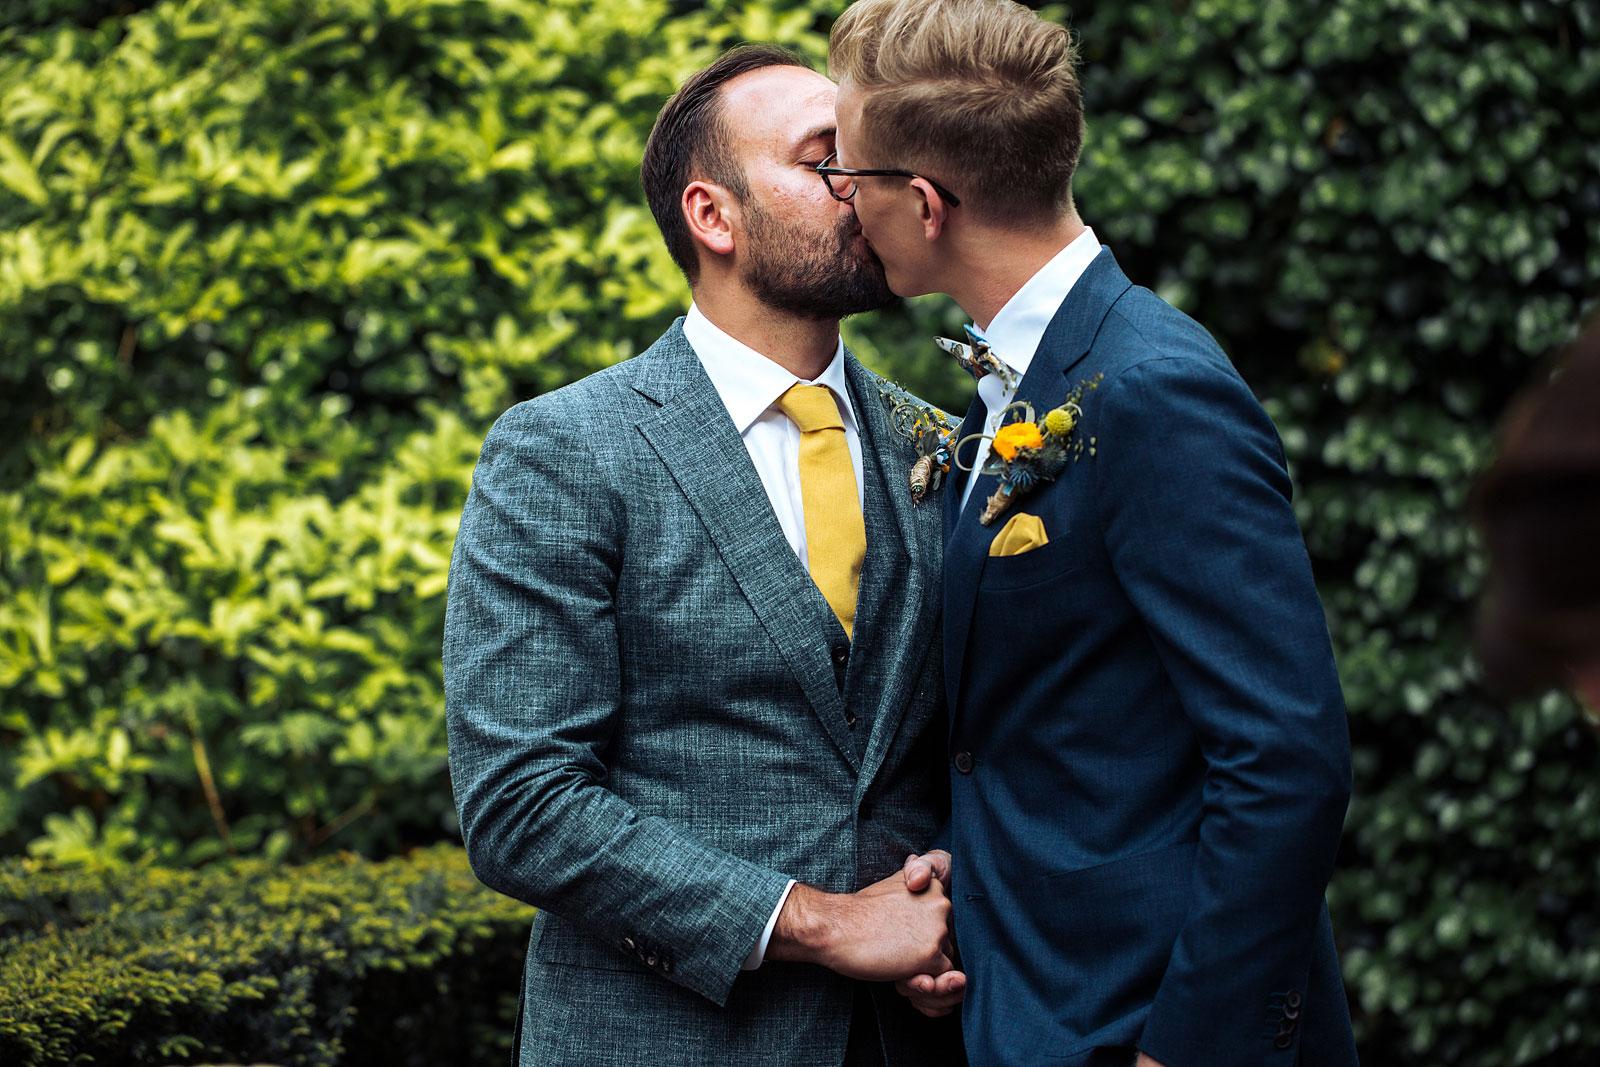 de kus bruiloft